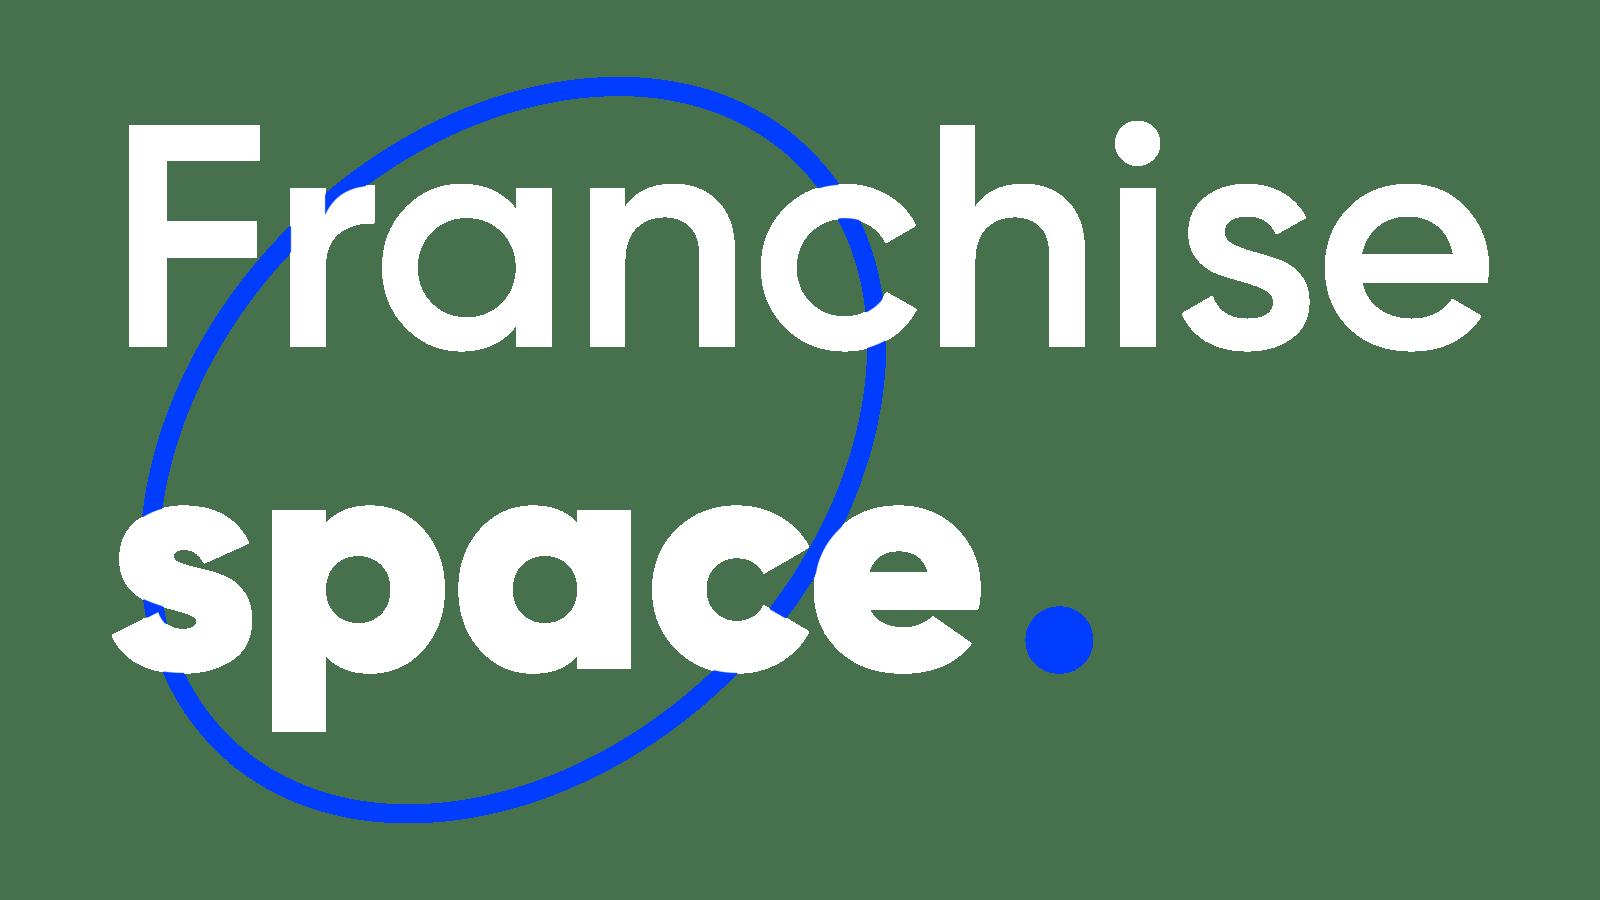 franchisespace.ru